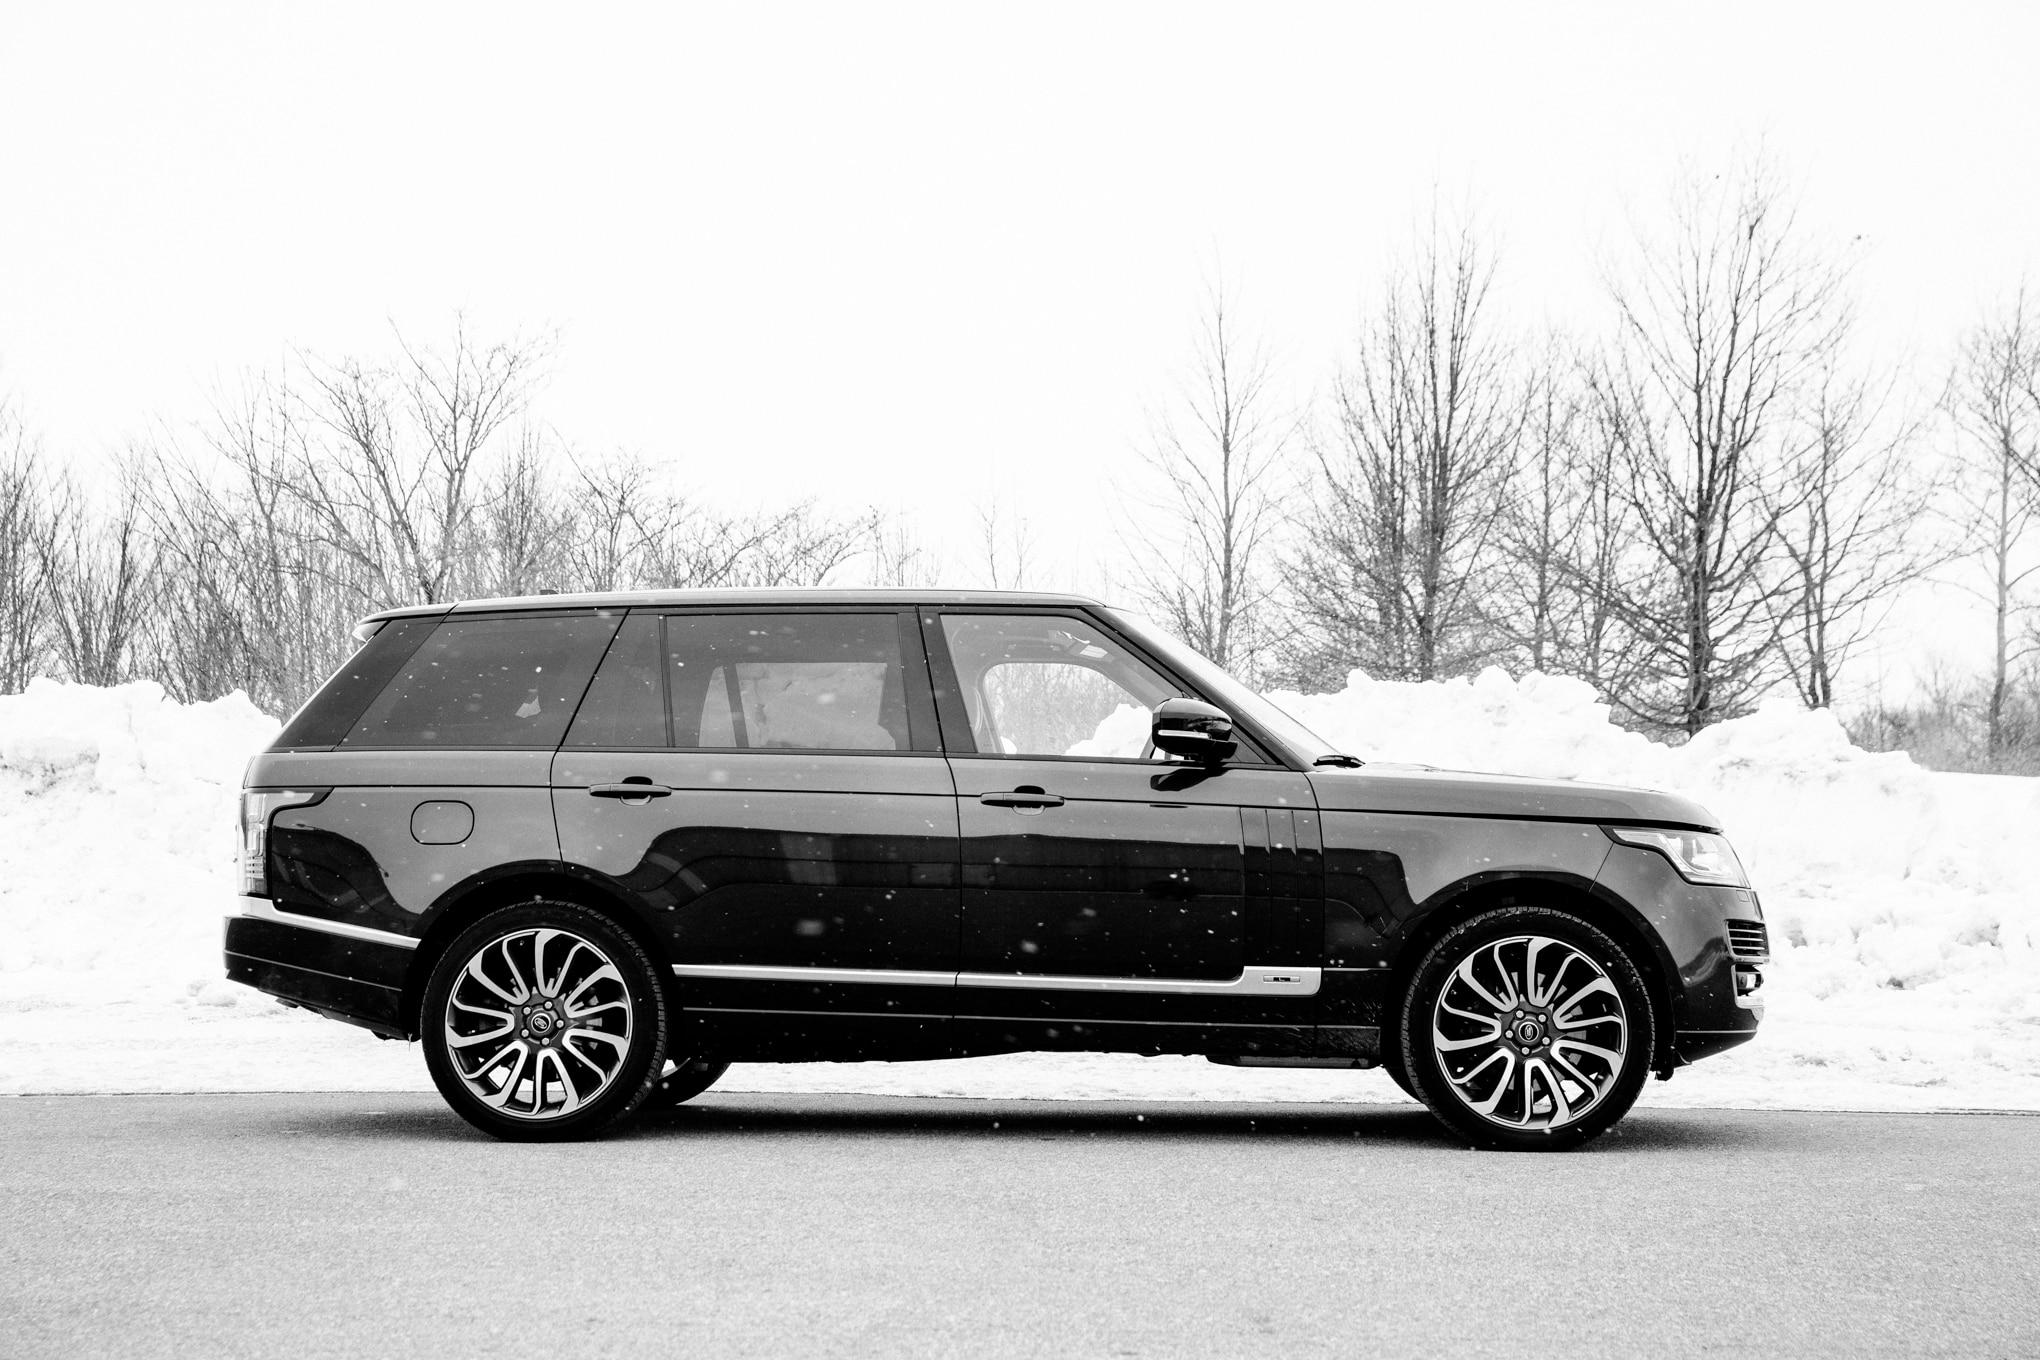 2014 Land Rover Range Rover Lwb Autobio Profile1